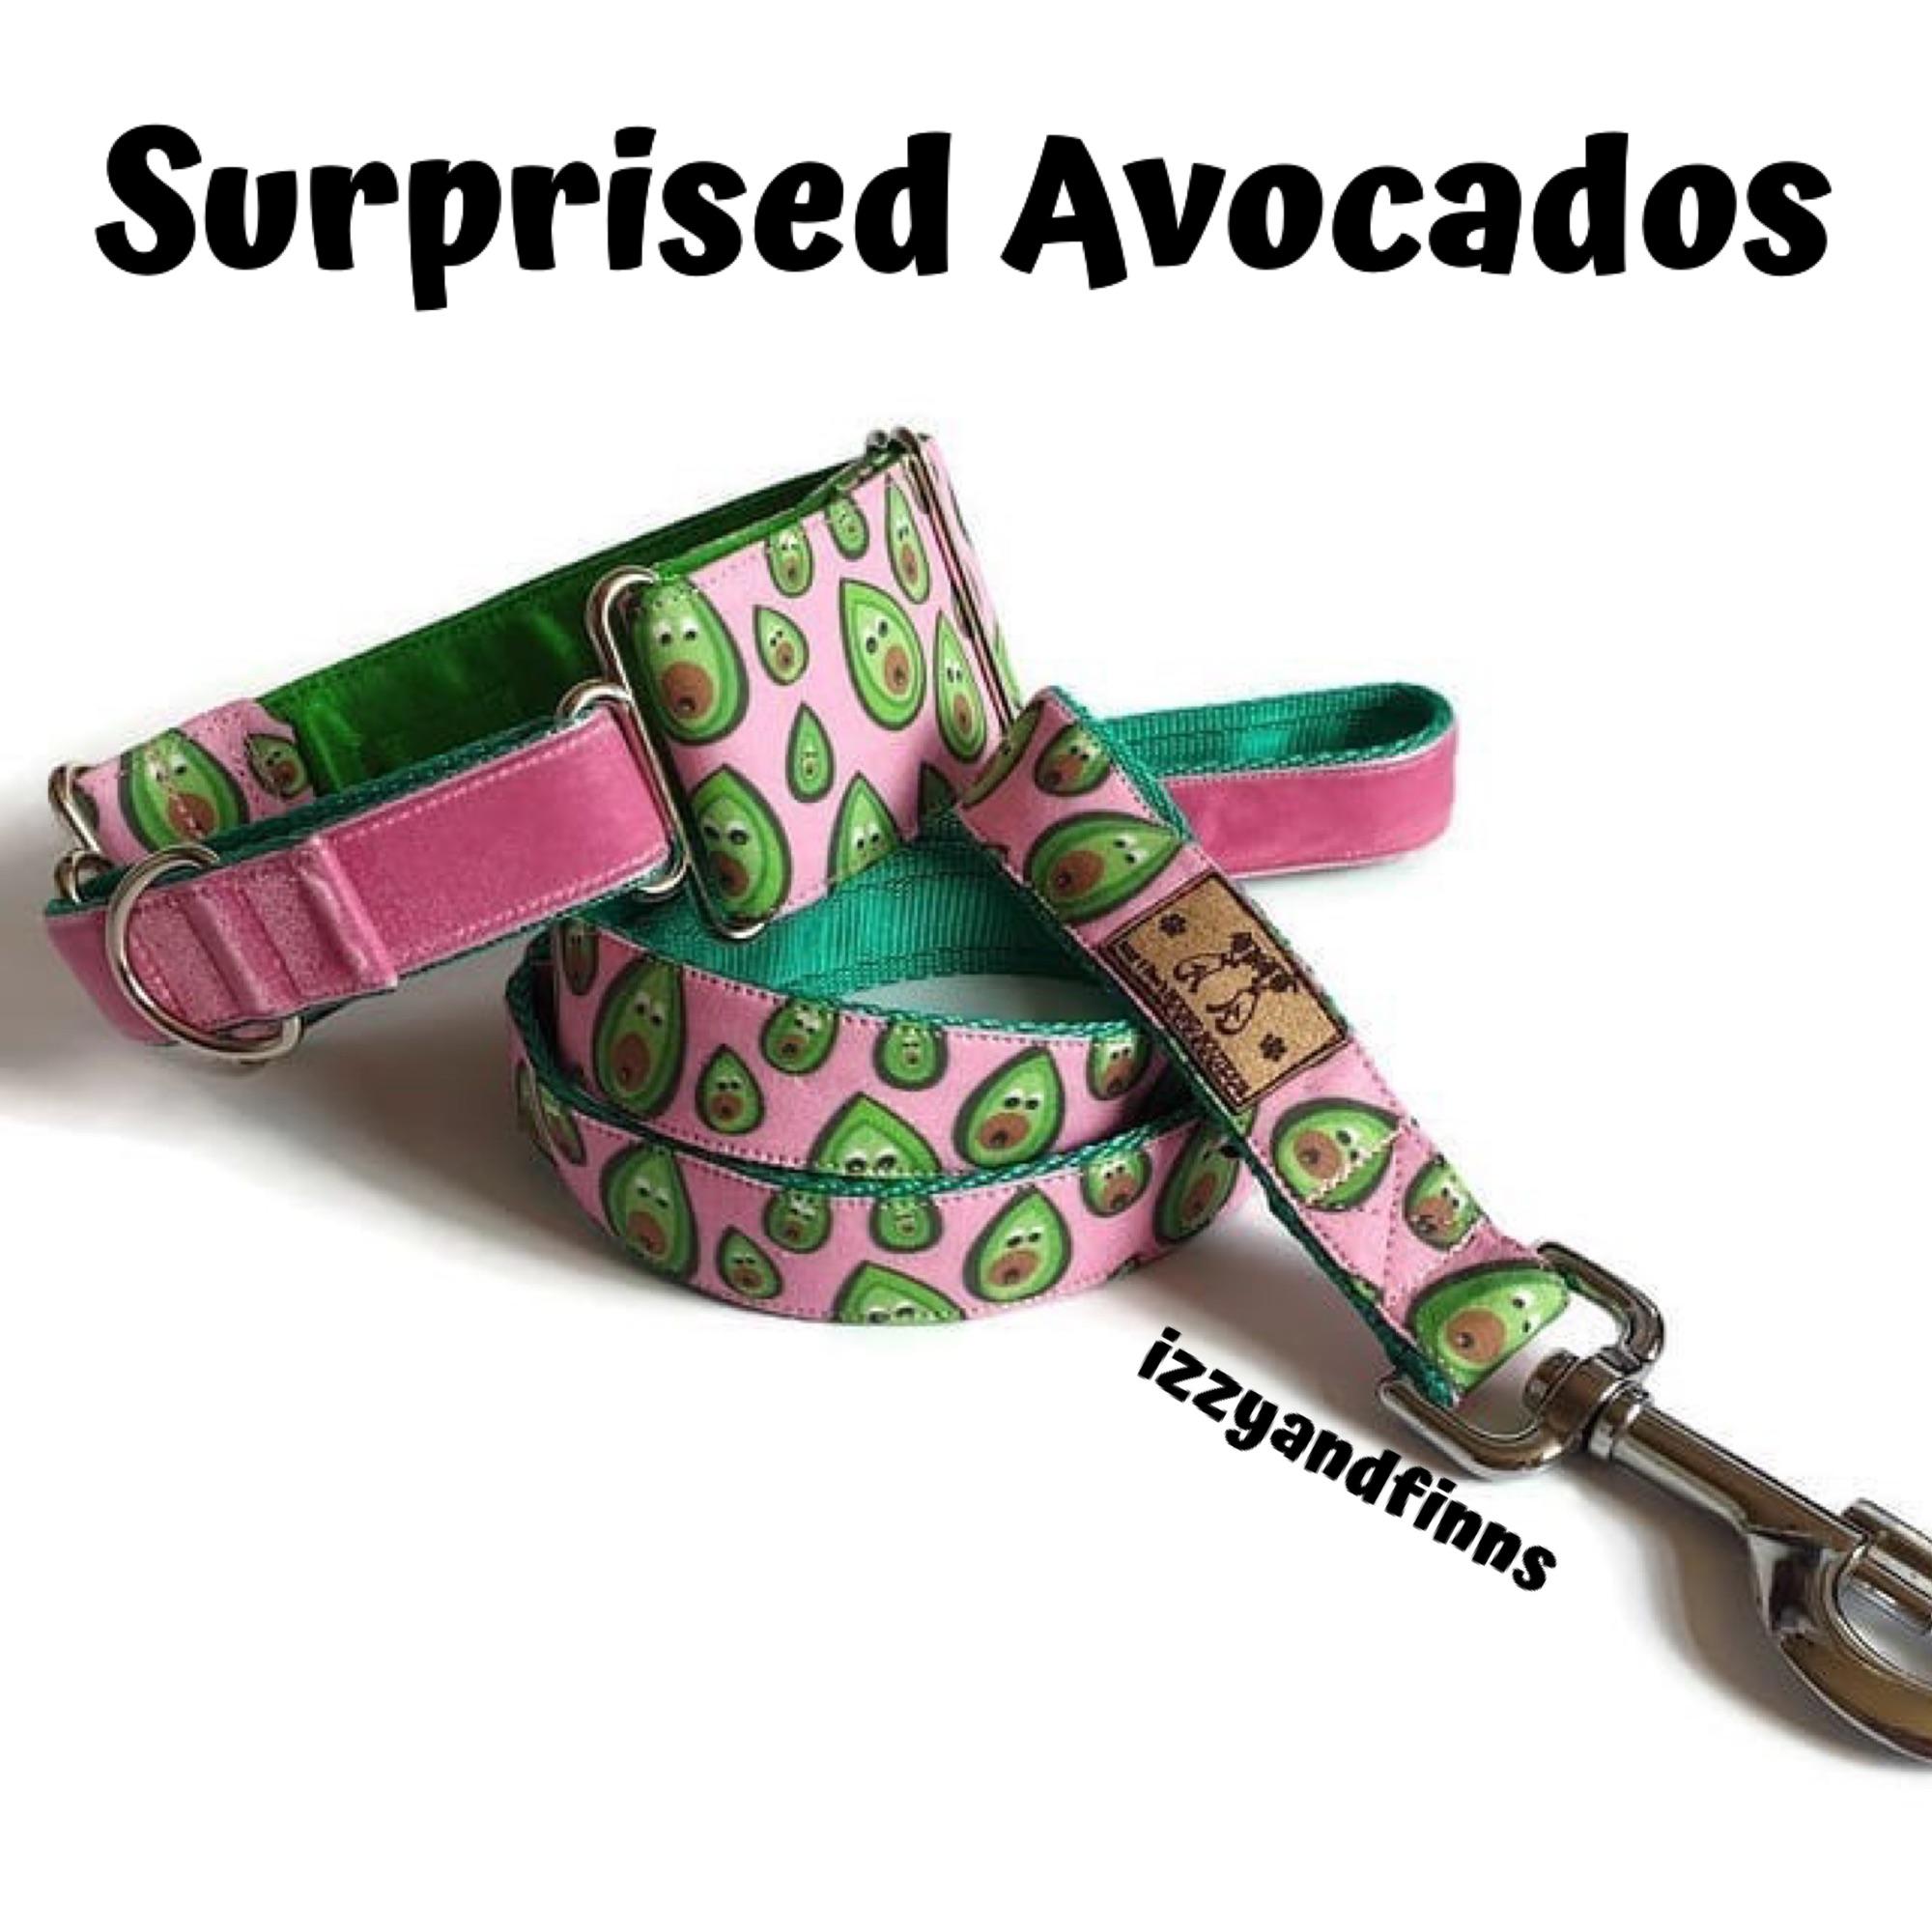 Surprised Avocados